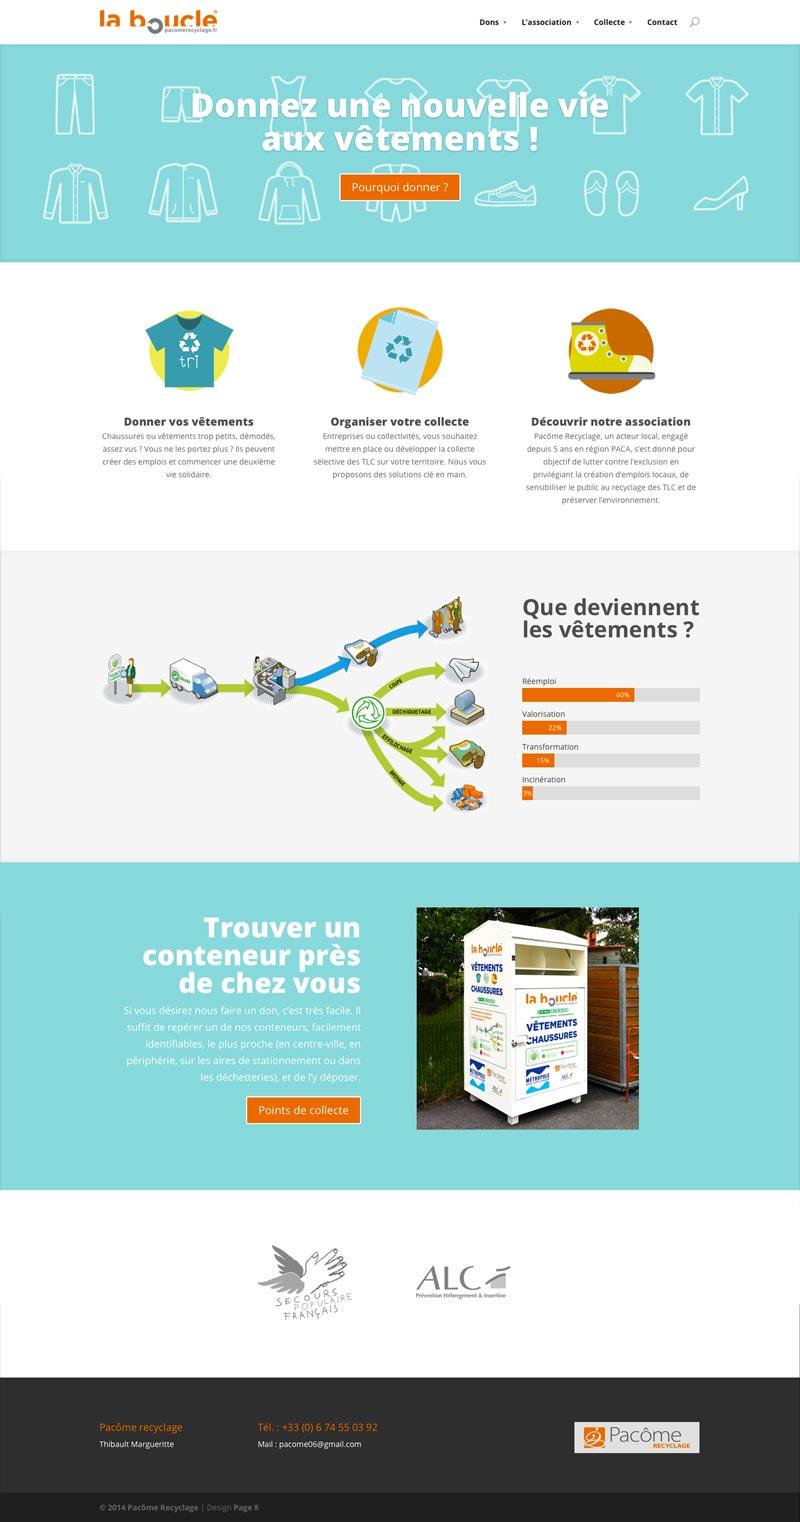 Pacôme Recyclage - Site Internet - Accueil